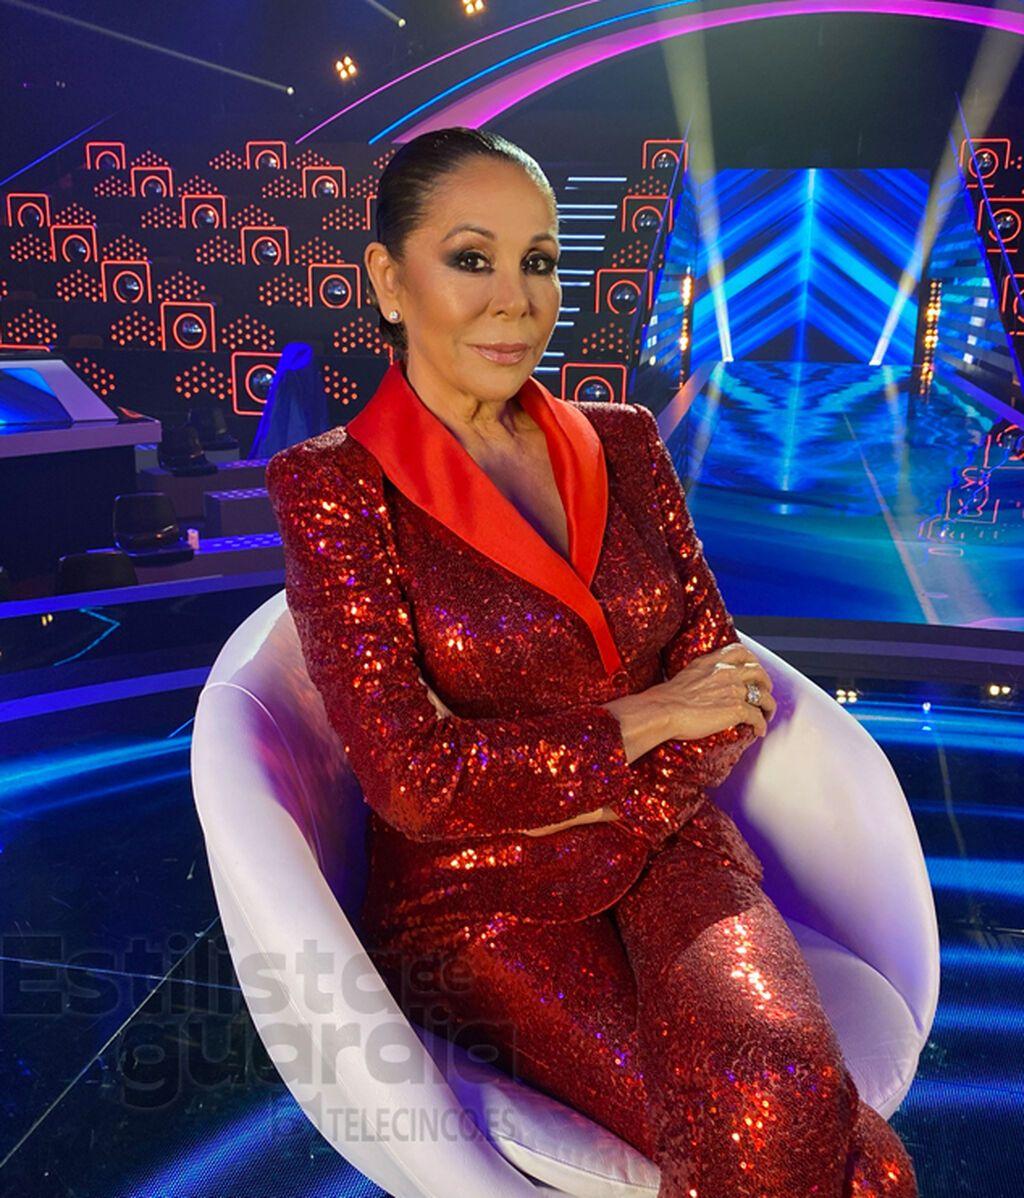 Isabel con smoking rojo